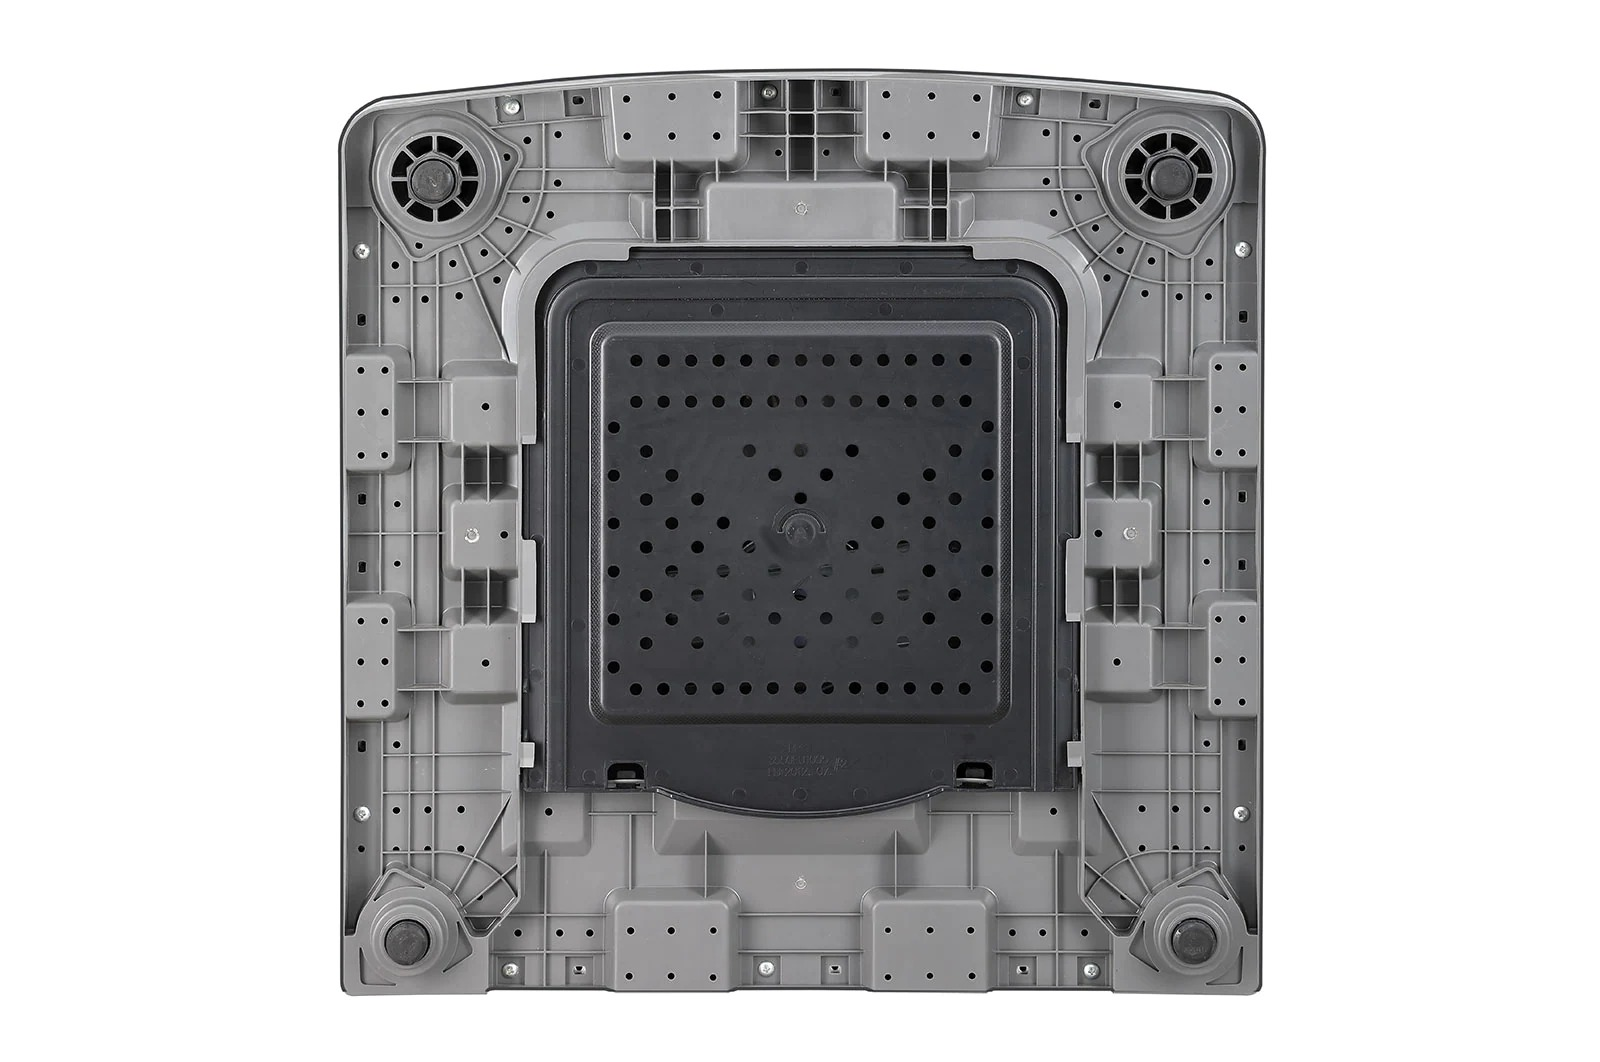 LG Washing Machine Fully Automatic TopLoad 6.5kg, 5 Star, Smart Inverter Technology